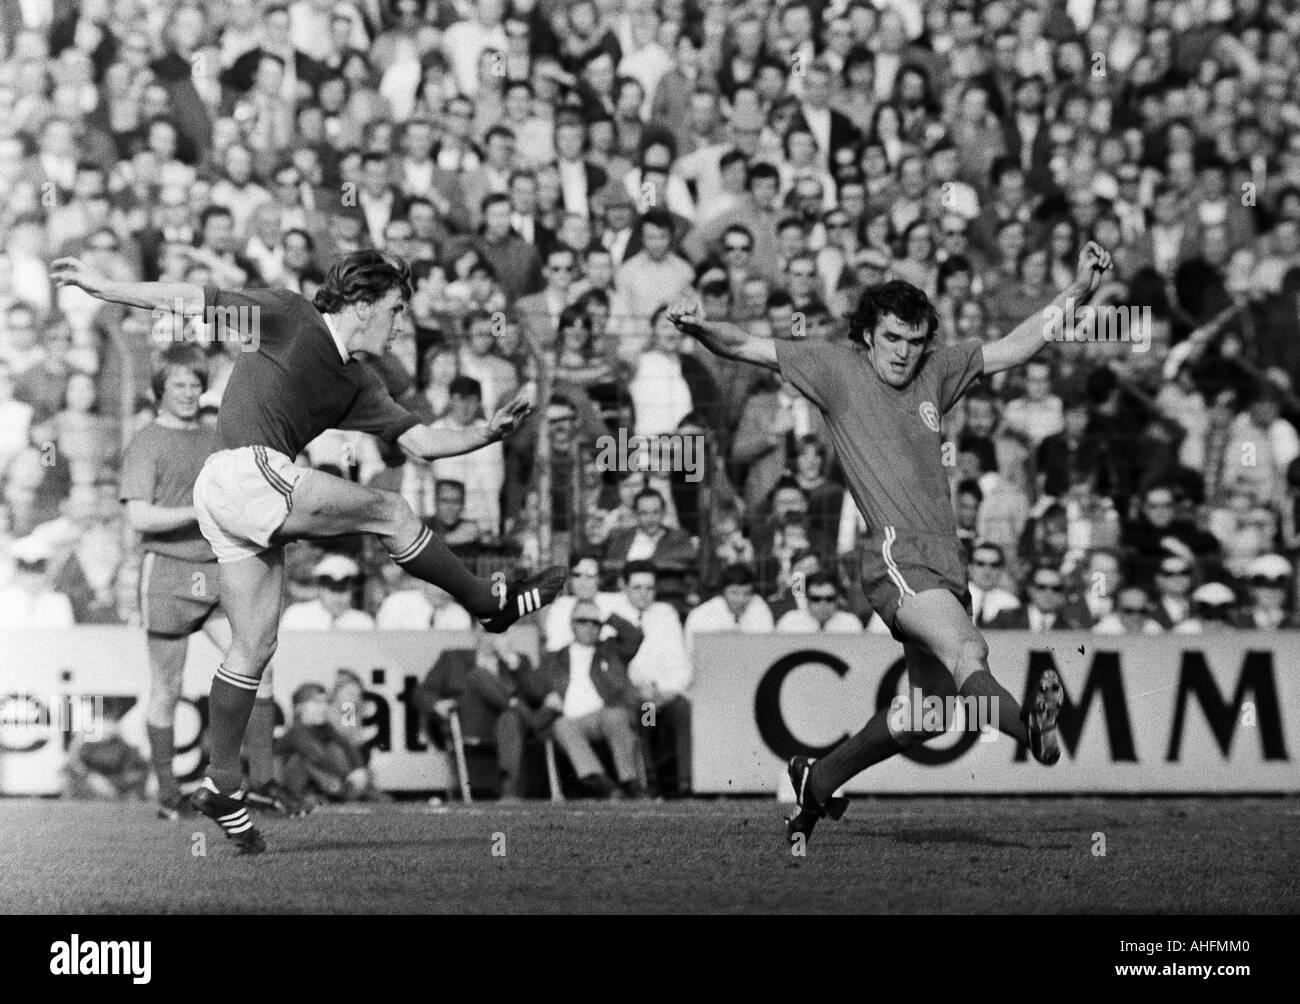 football, Bundesliga, 1971/1972, FC Schalke 04 versus Fortuna Duesseldorf 3:0, Glueckaufkampfbahn Stadium in Gelsenkirchen, scene of the match, Herbert Luetkebohmert (S04) left shots on gaol, right Peter Biesenkamp (Fortuna) - Stock Image